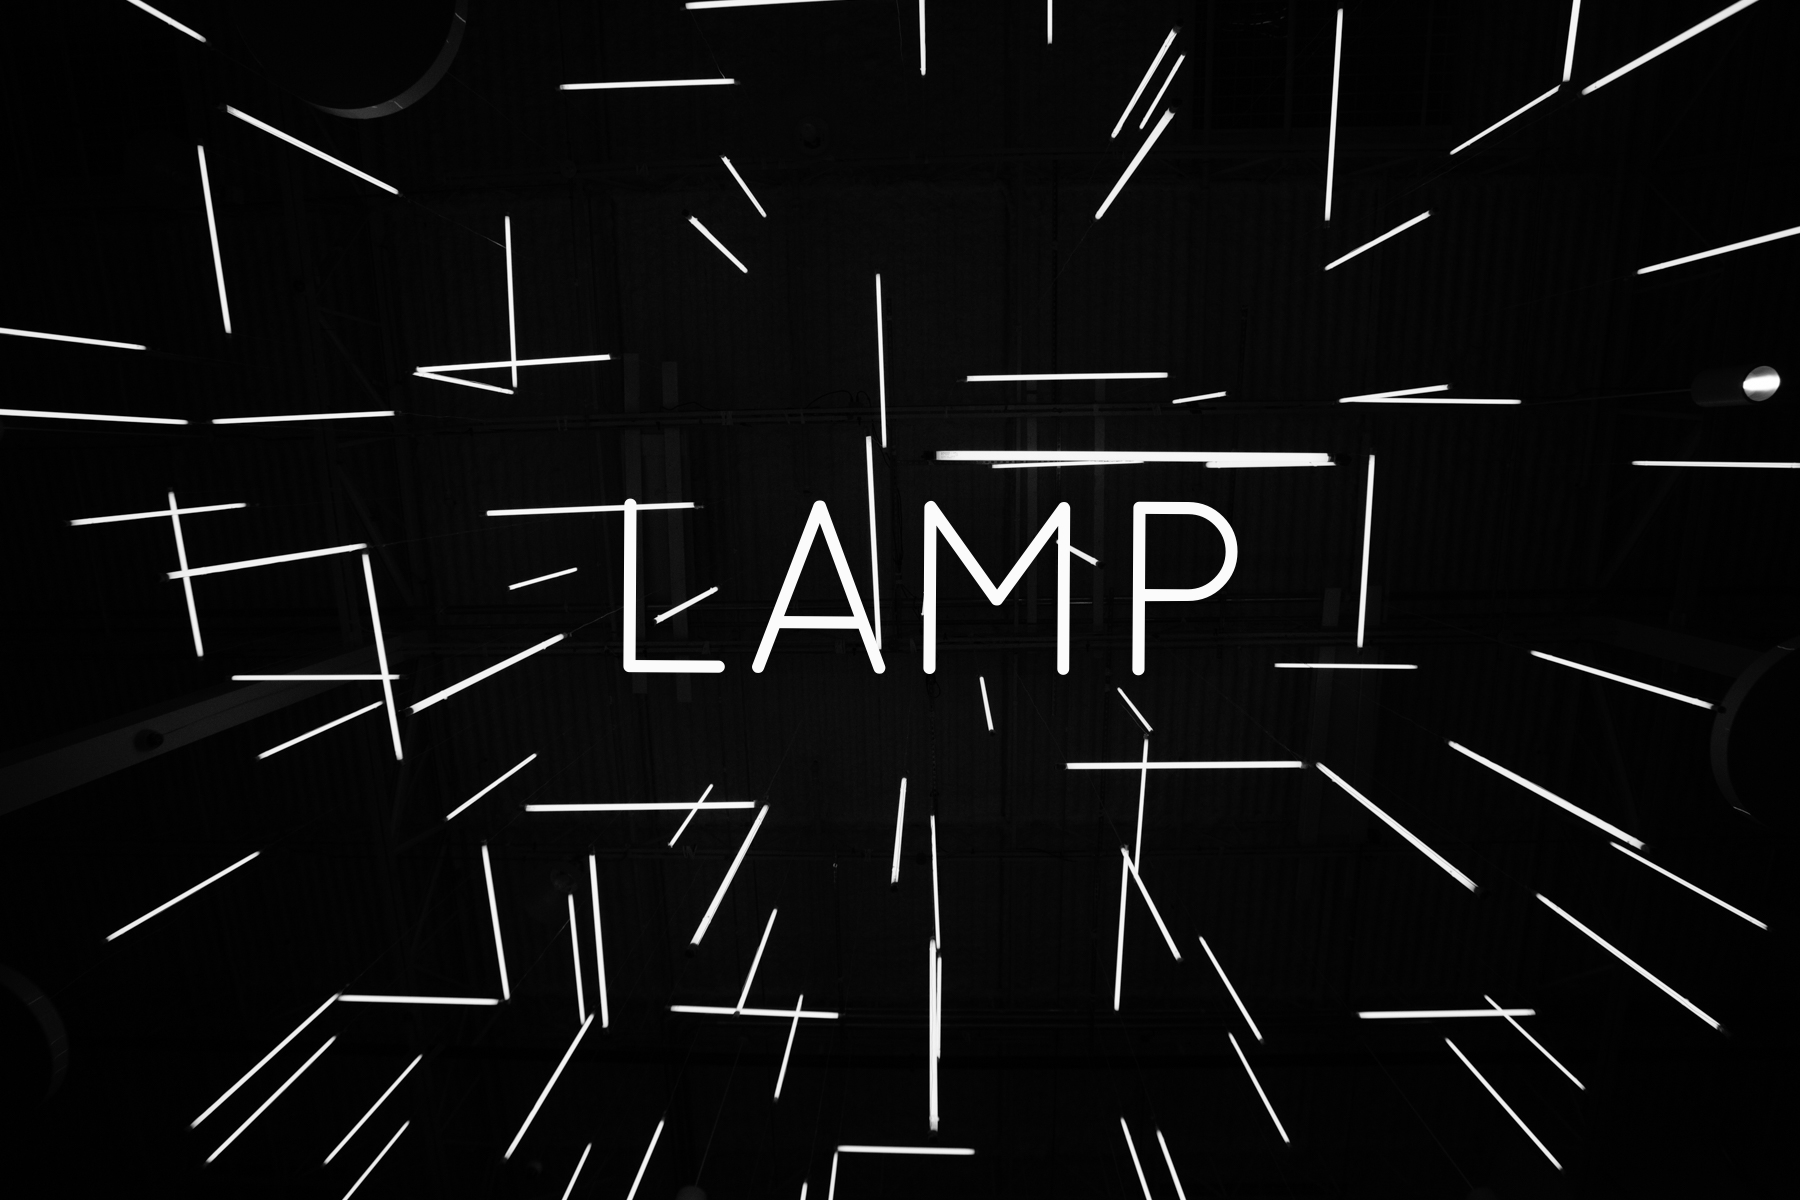 Greene Stage Design - LAMP fluorescent light bulb light installation Greenestagedesign.com at Passion City Church